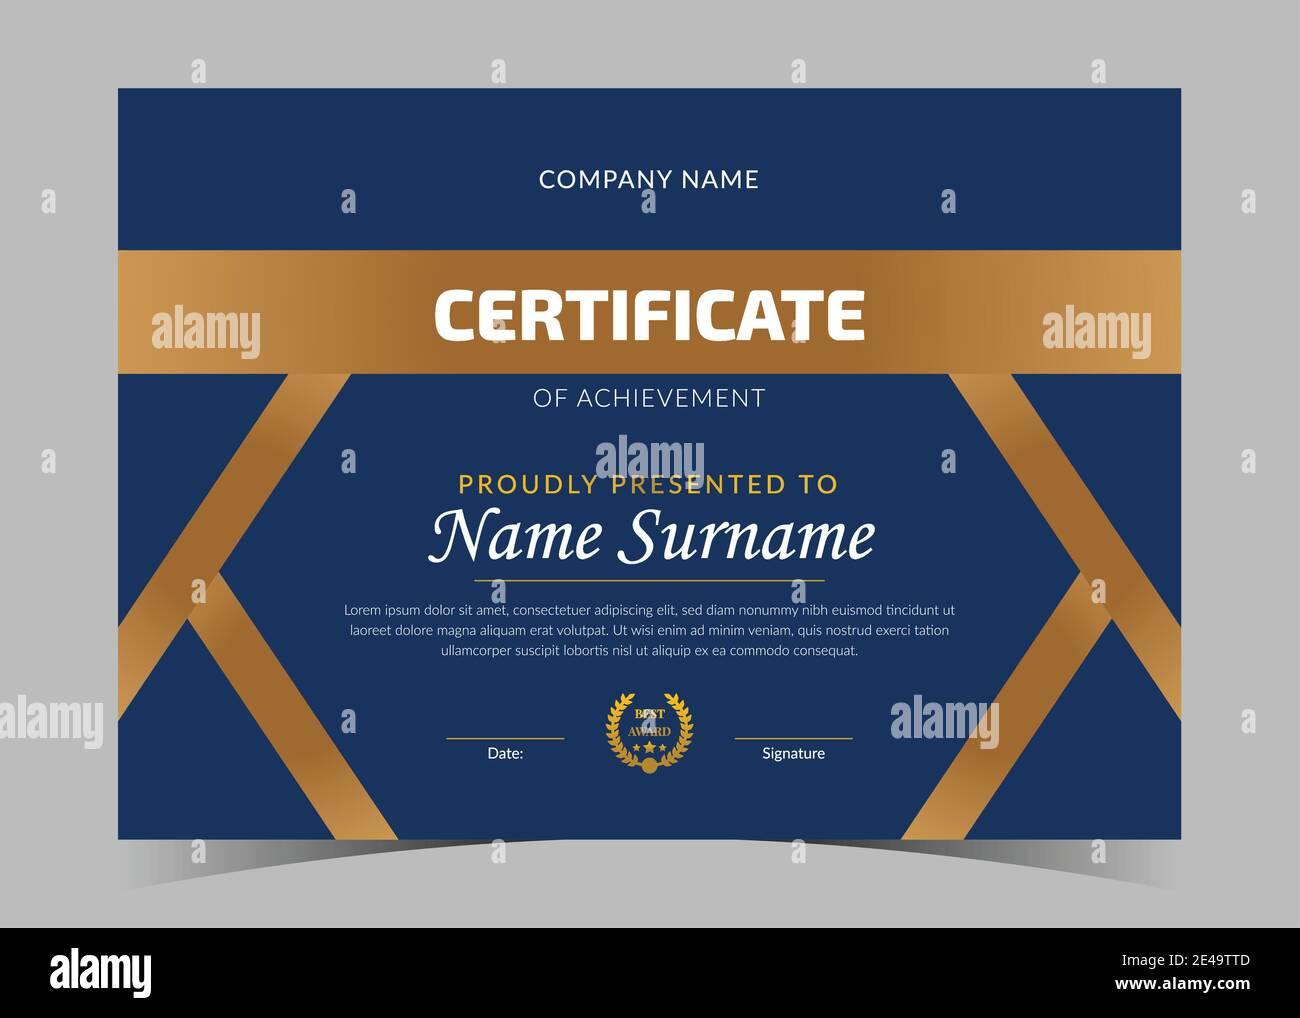 modern certificate template. certificate design, certificate Pertaining To Award Certificate Design Template